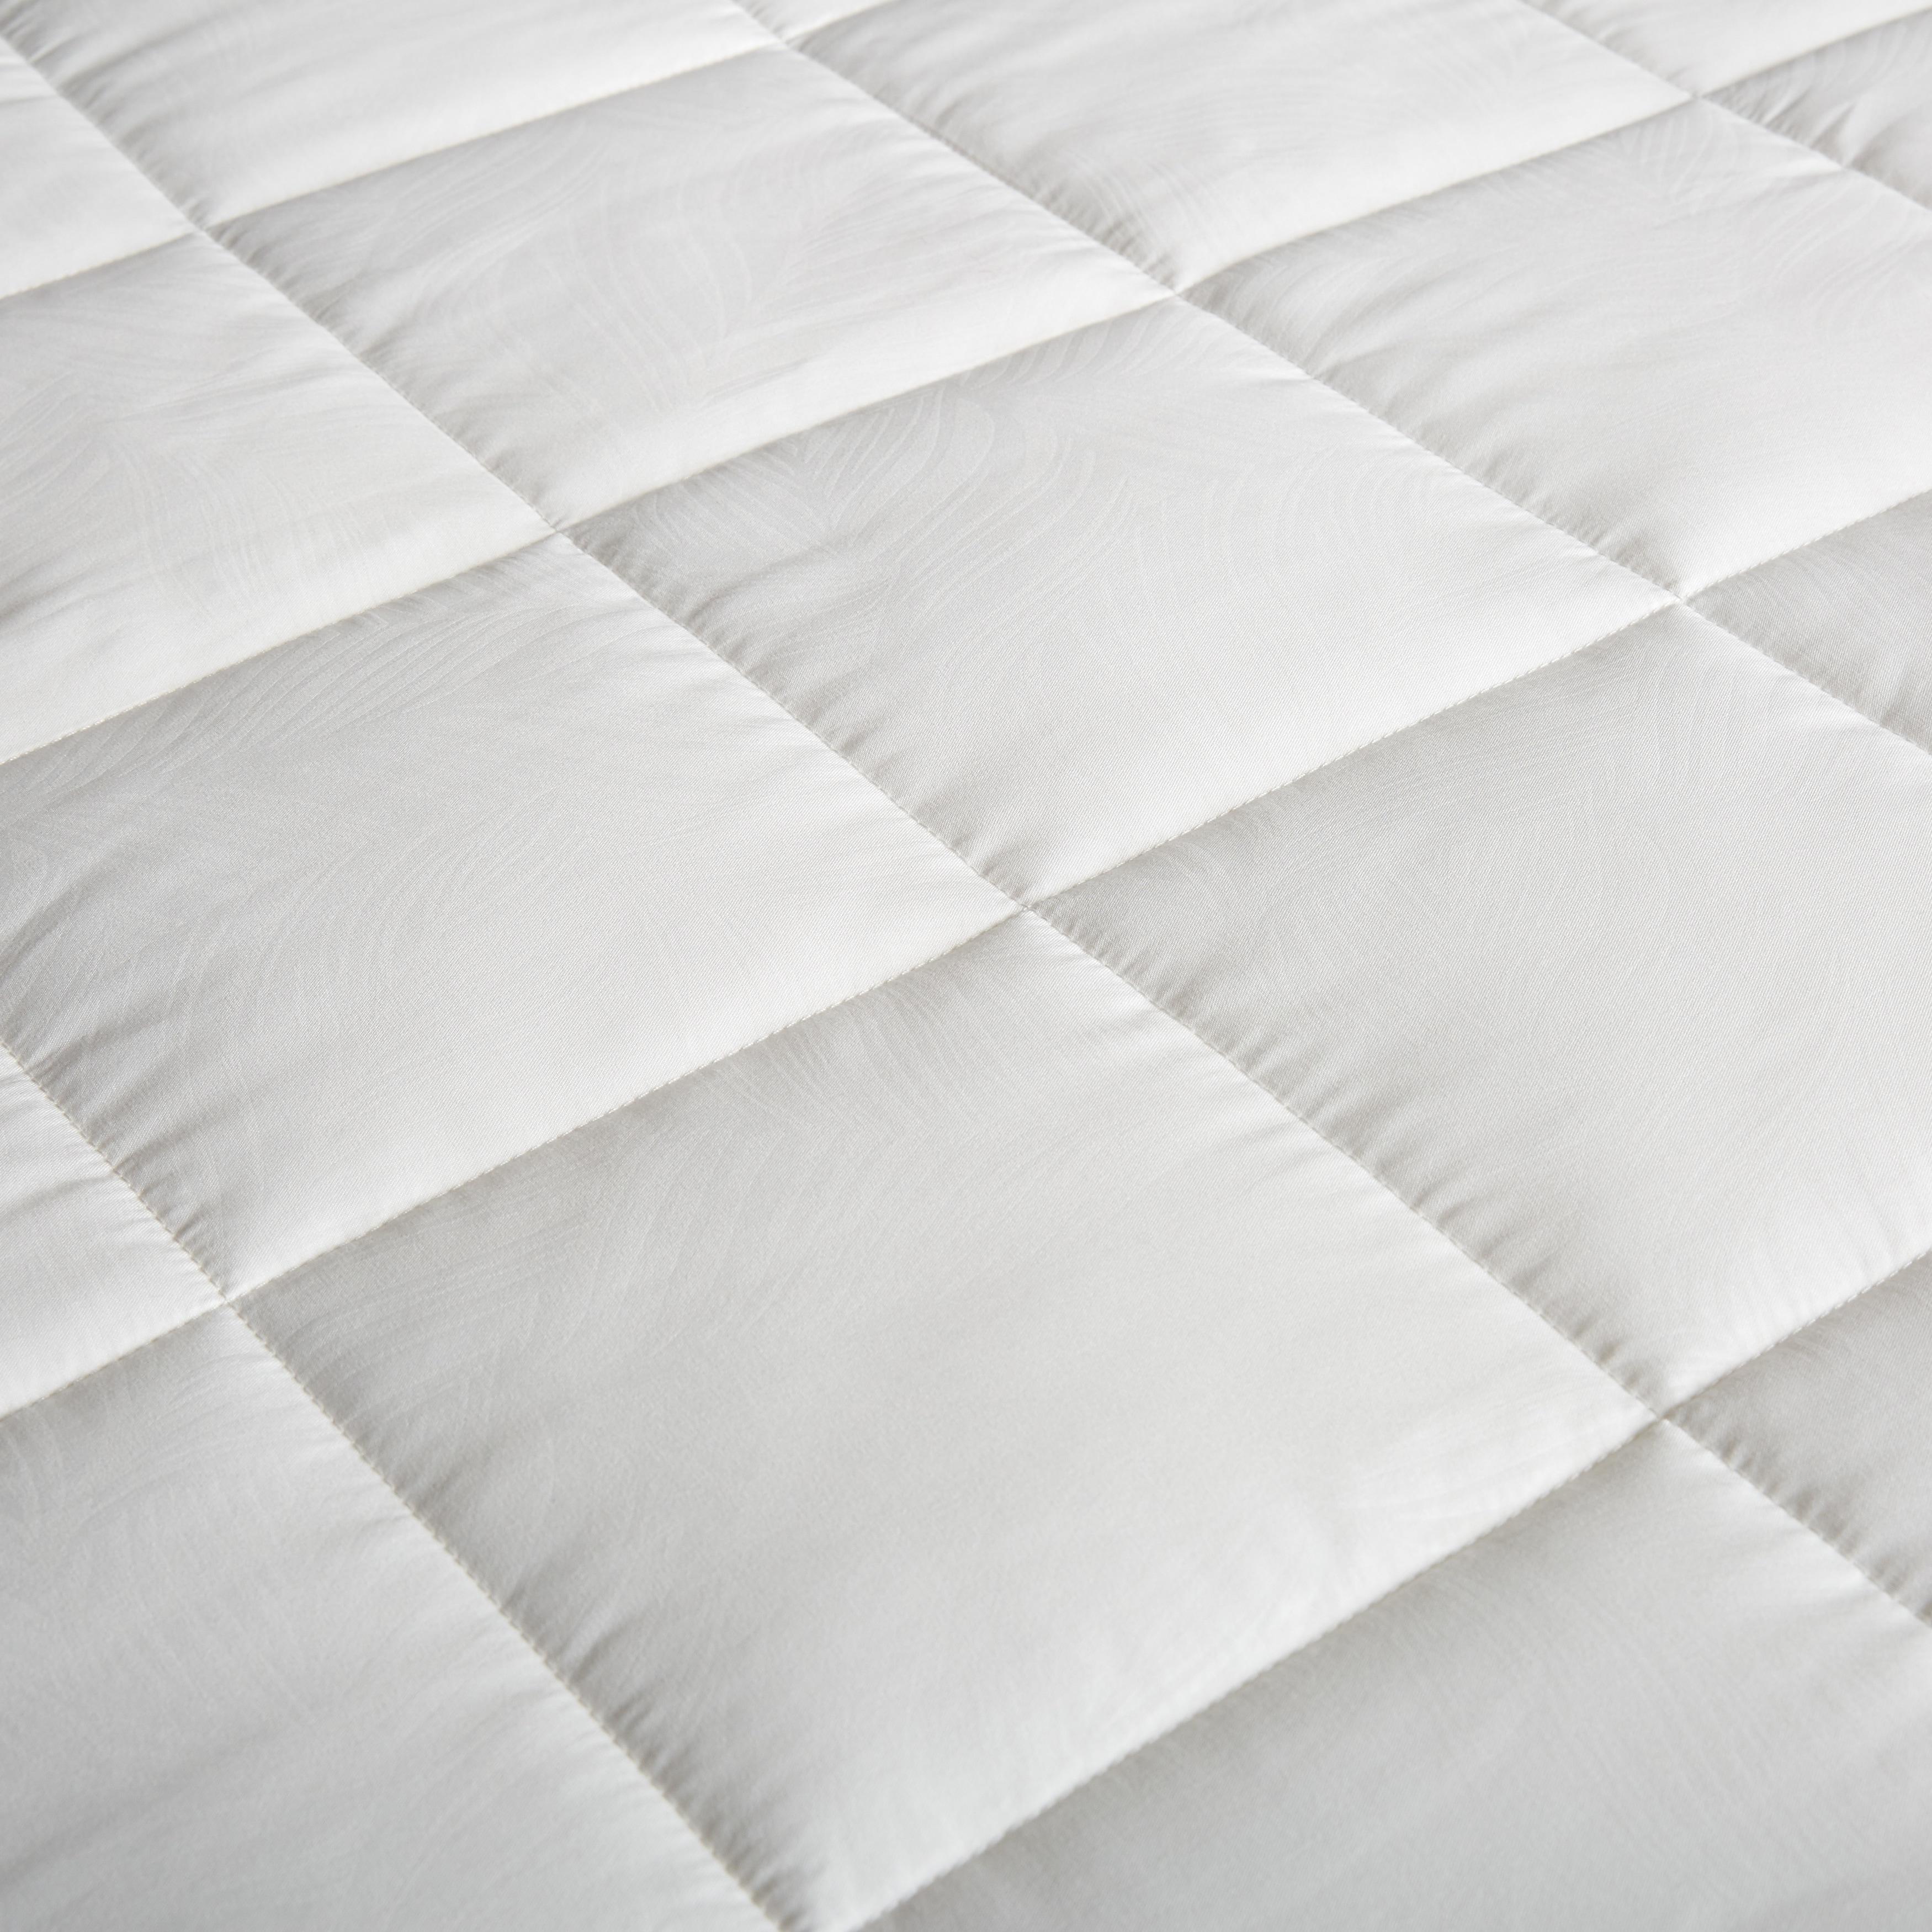 mattress pattern. Shop Tommy Bahama Beige Banana Leaf Pattern Reversible Microfiber Down-Alternative Blanket - On Sale Free Shipping Today Overstock.com 12037648 Mattress